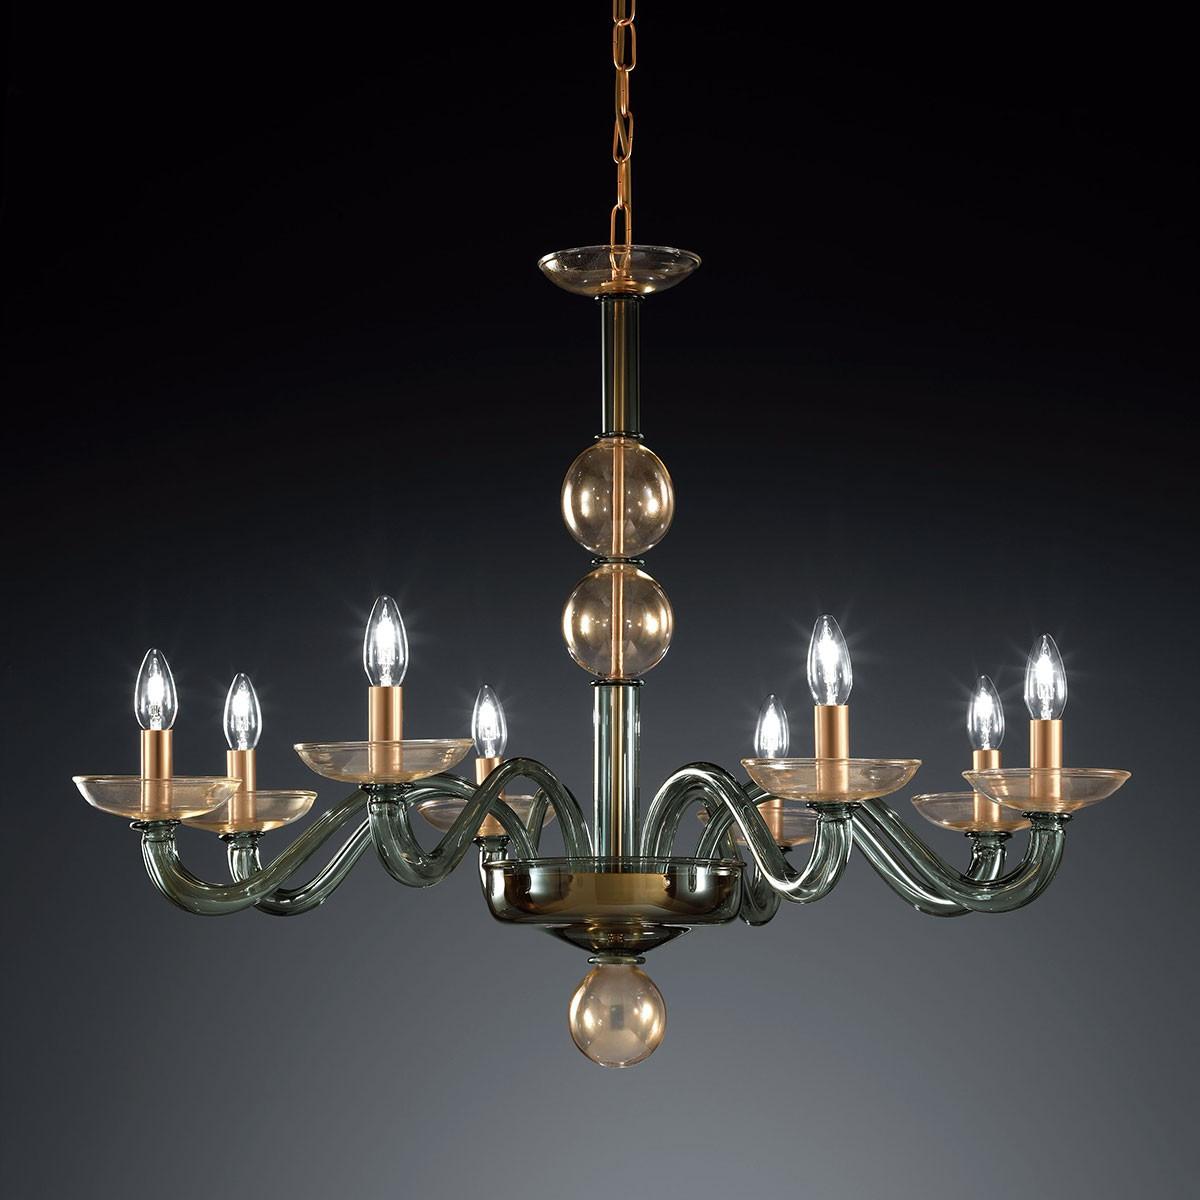 """Tibaldo"" lampara de araña de Murano - 8 luces - verde y oro"